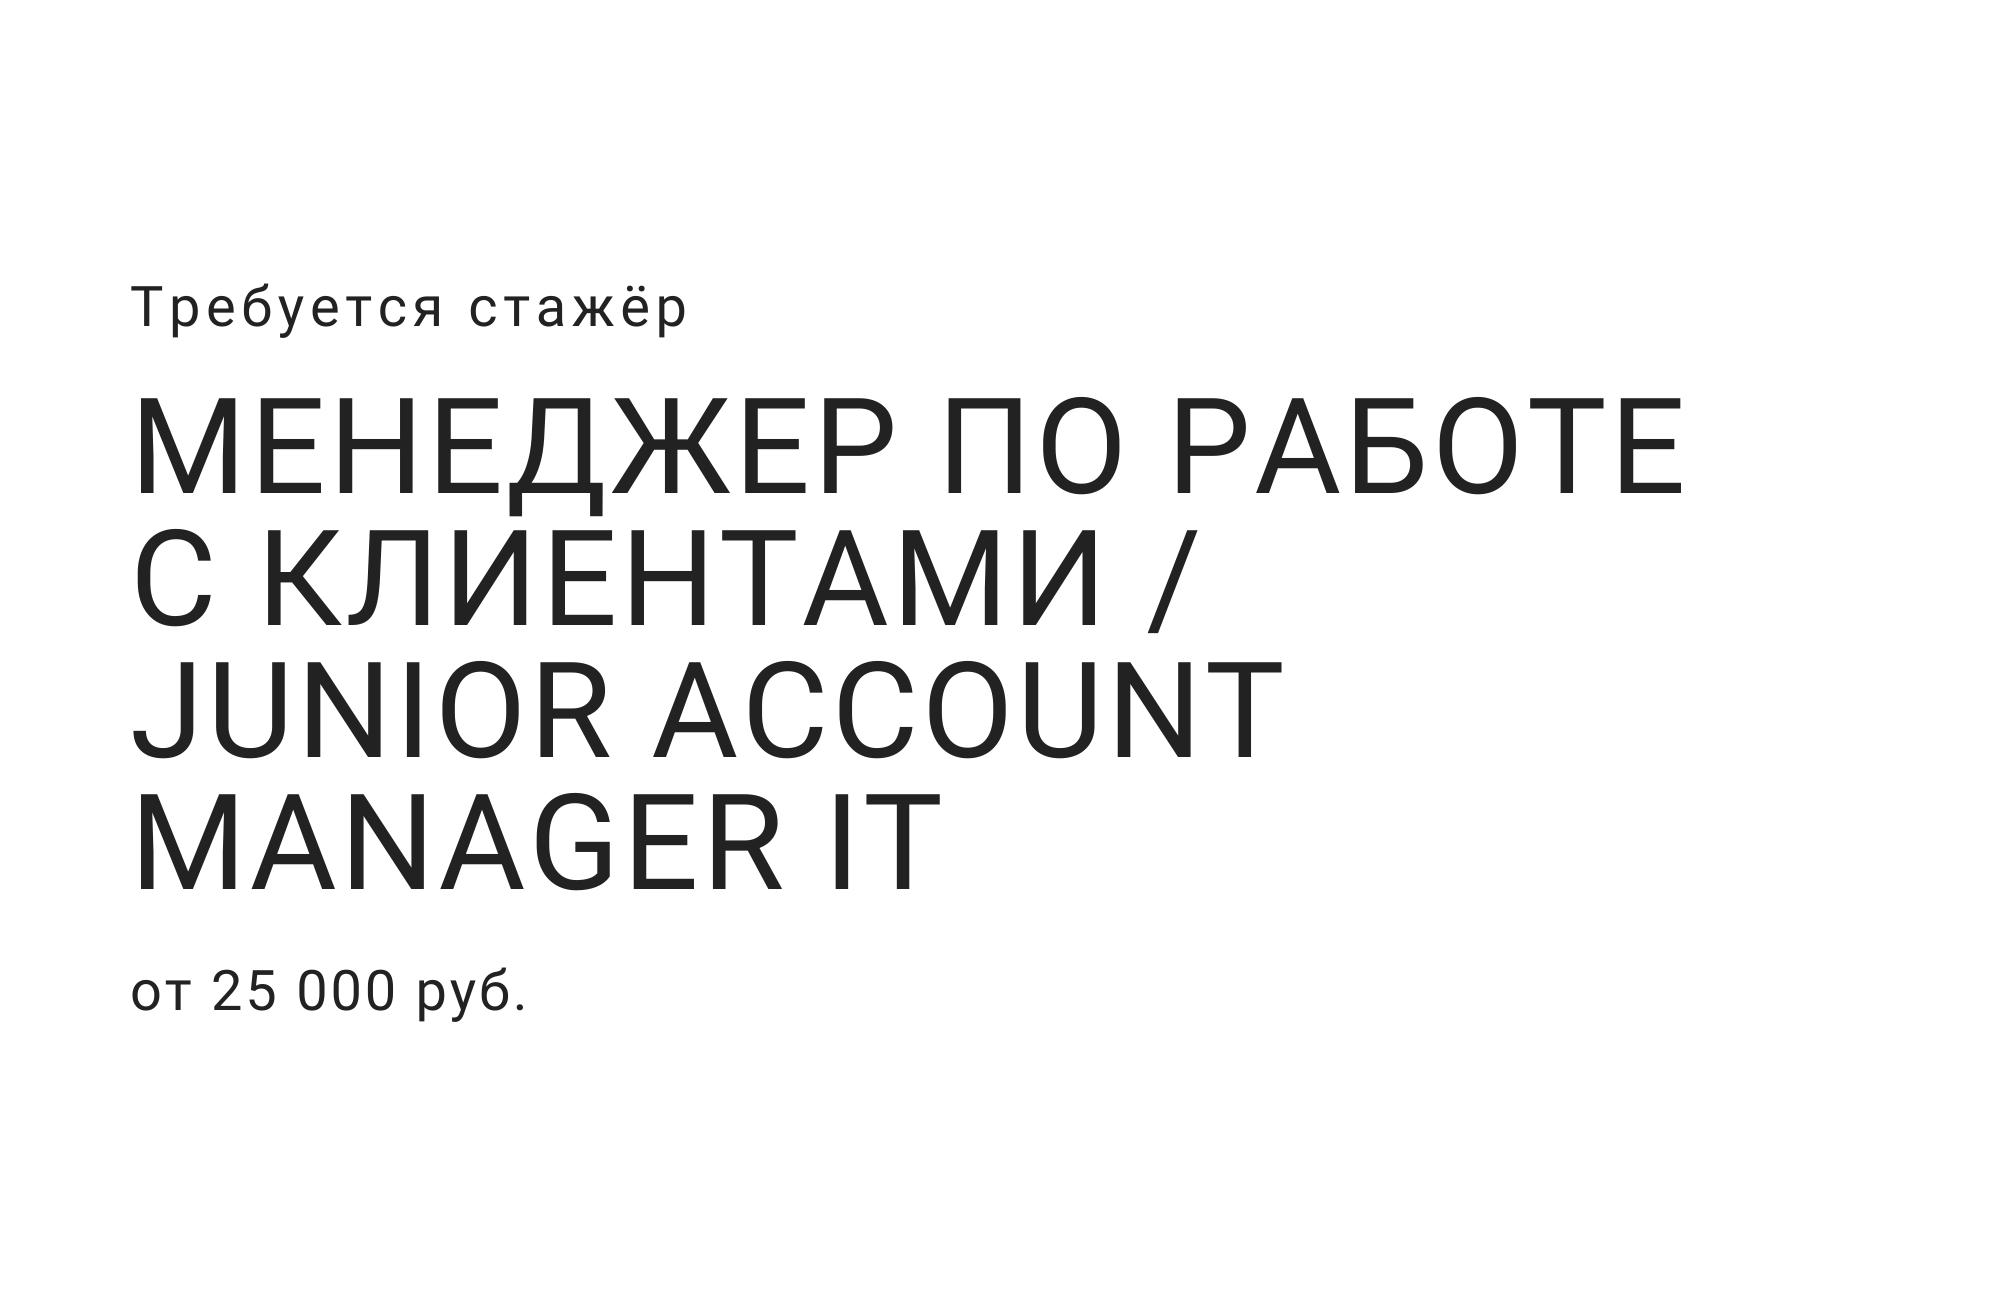 Junior Account manager IT / Менеджер по работе с клиентами (стажер)